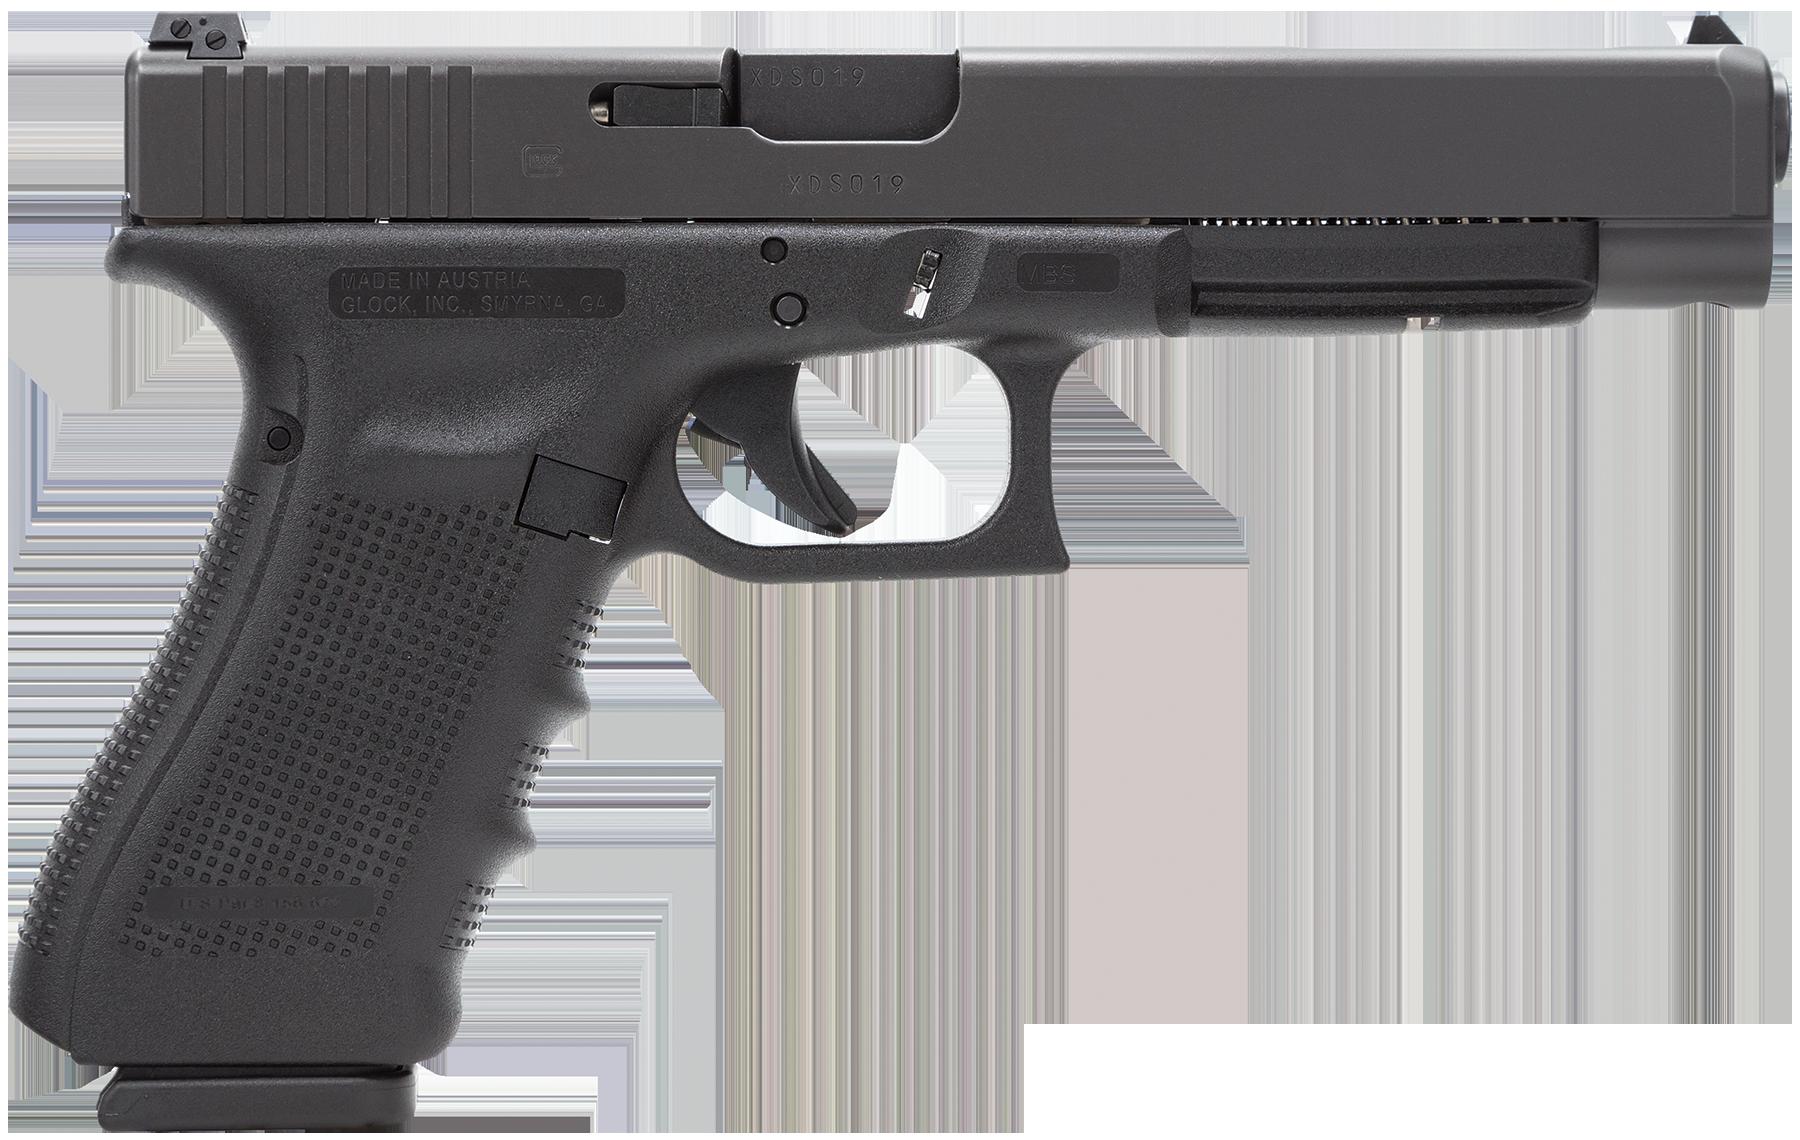 40 glock bullet clipart jpg freeuse Glock 22 .40 S&W Glock Ges.m.b.H. GLOCK 17 - others png download ... jpg freeuse